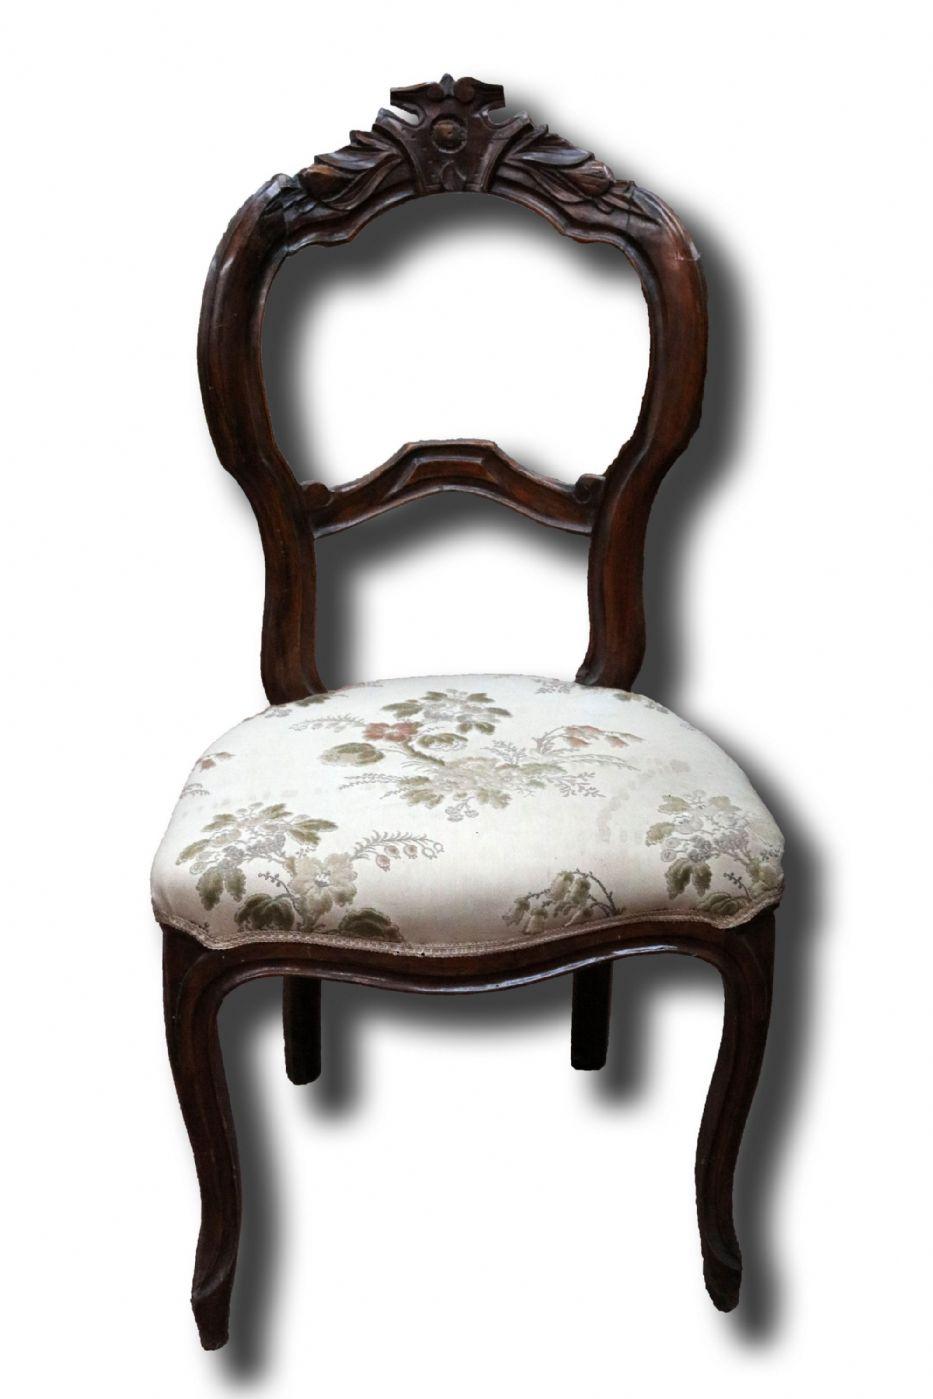 Sedia antica in legno. Epoca 1800. | Antiquariato su Anticoantico